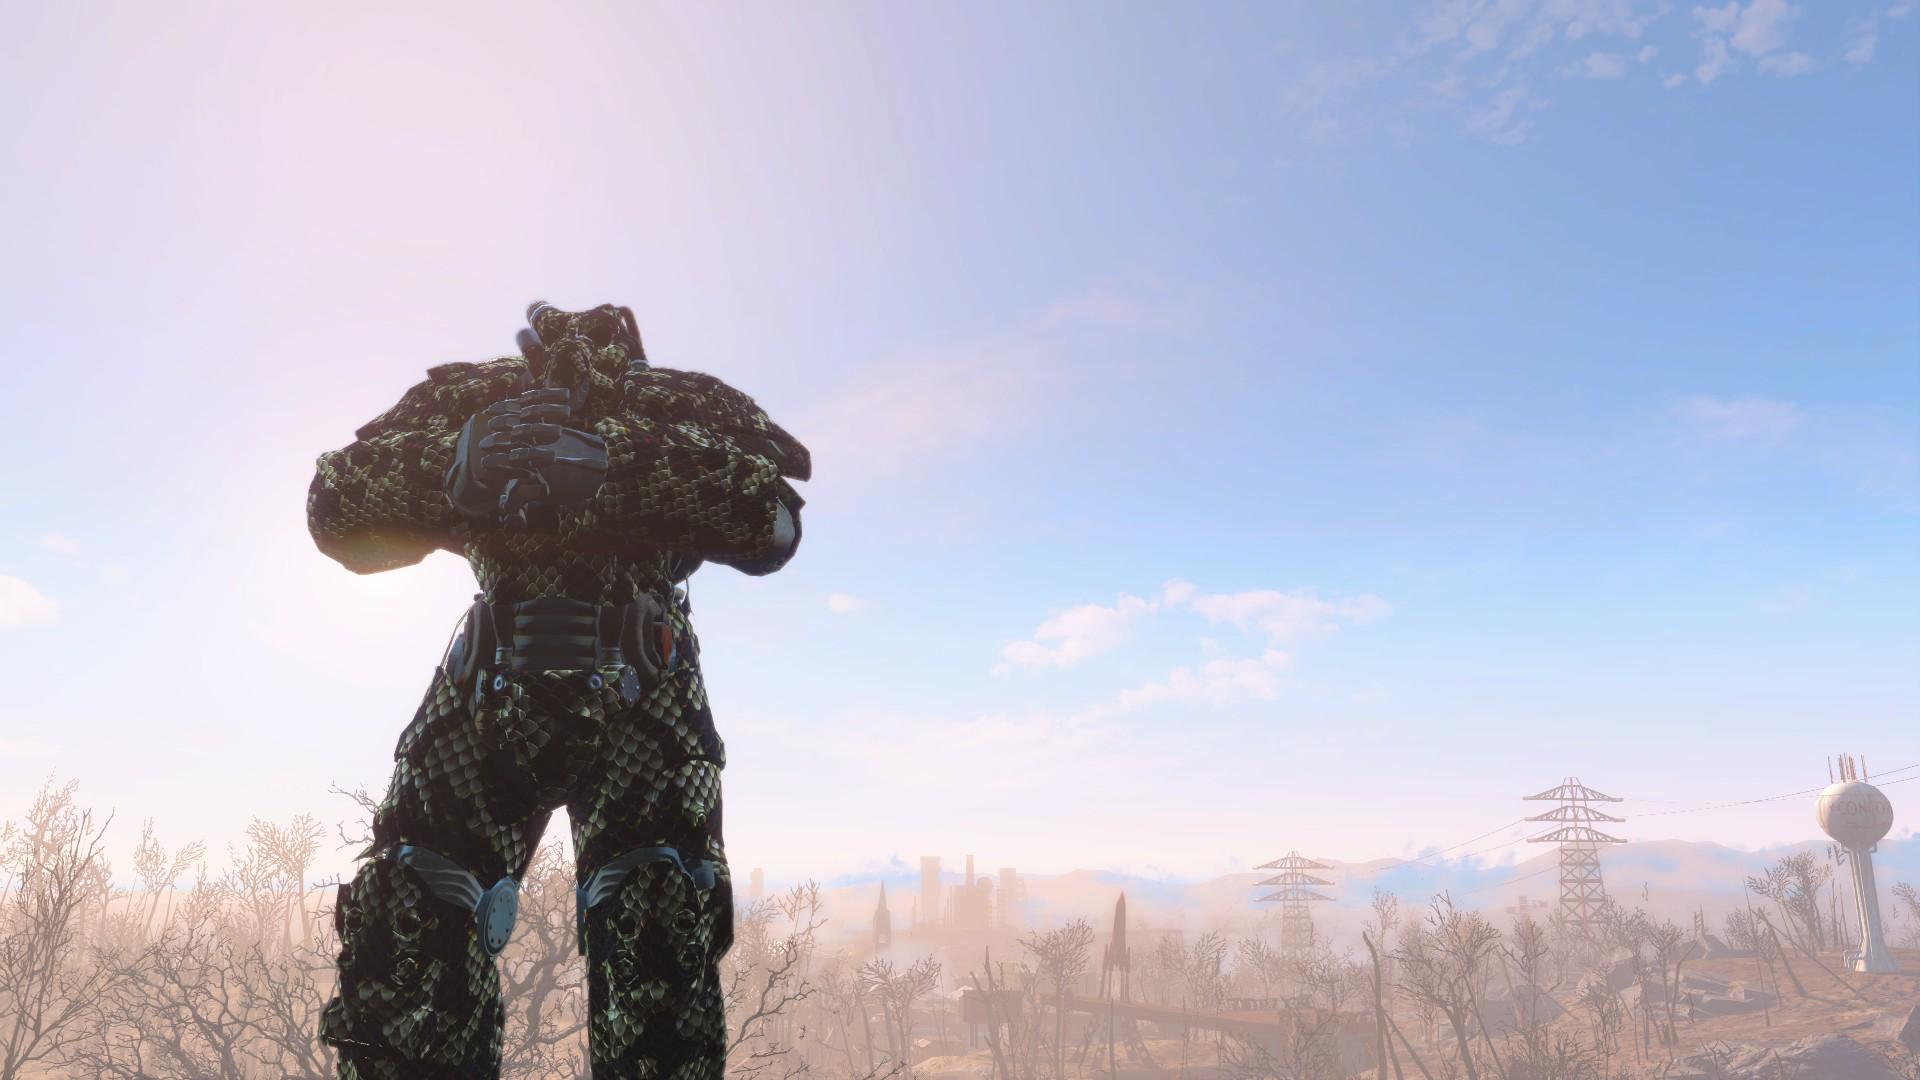 20190421201114_1.jpg - Fallout 4